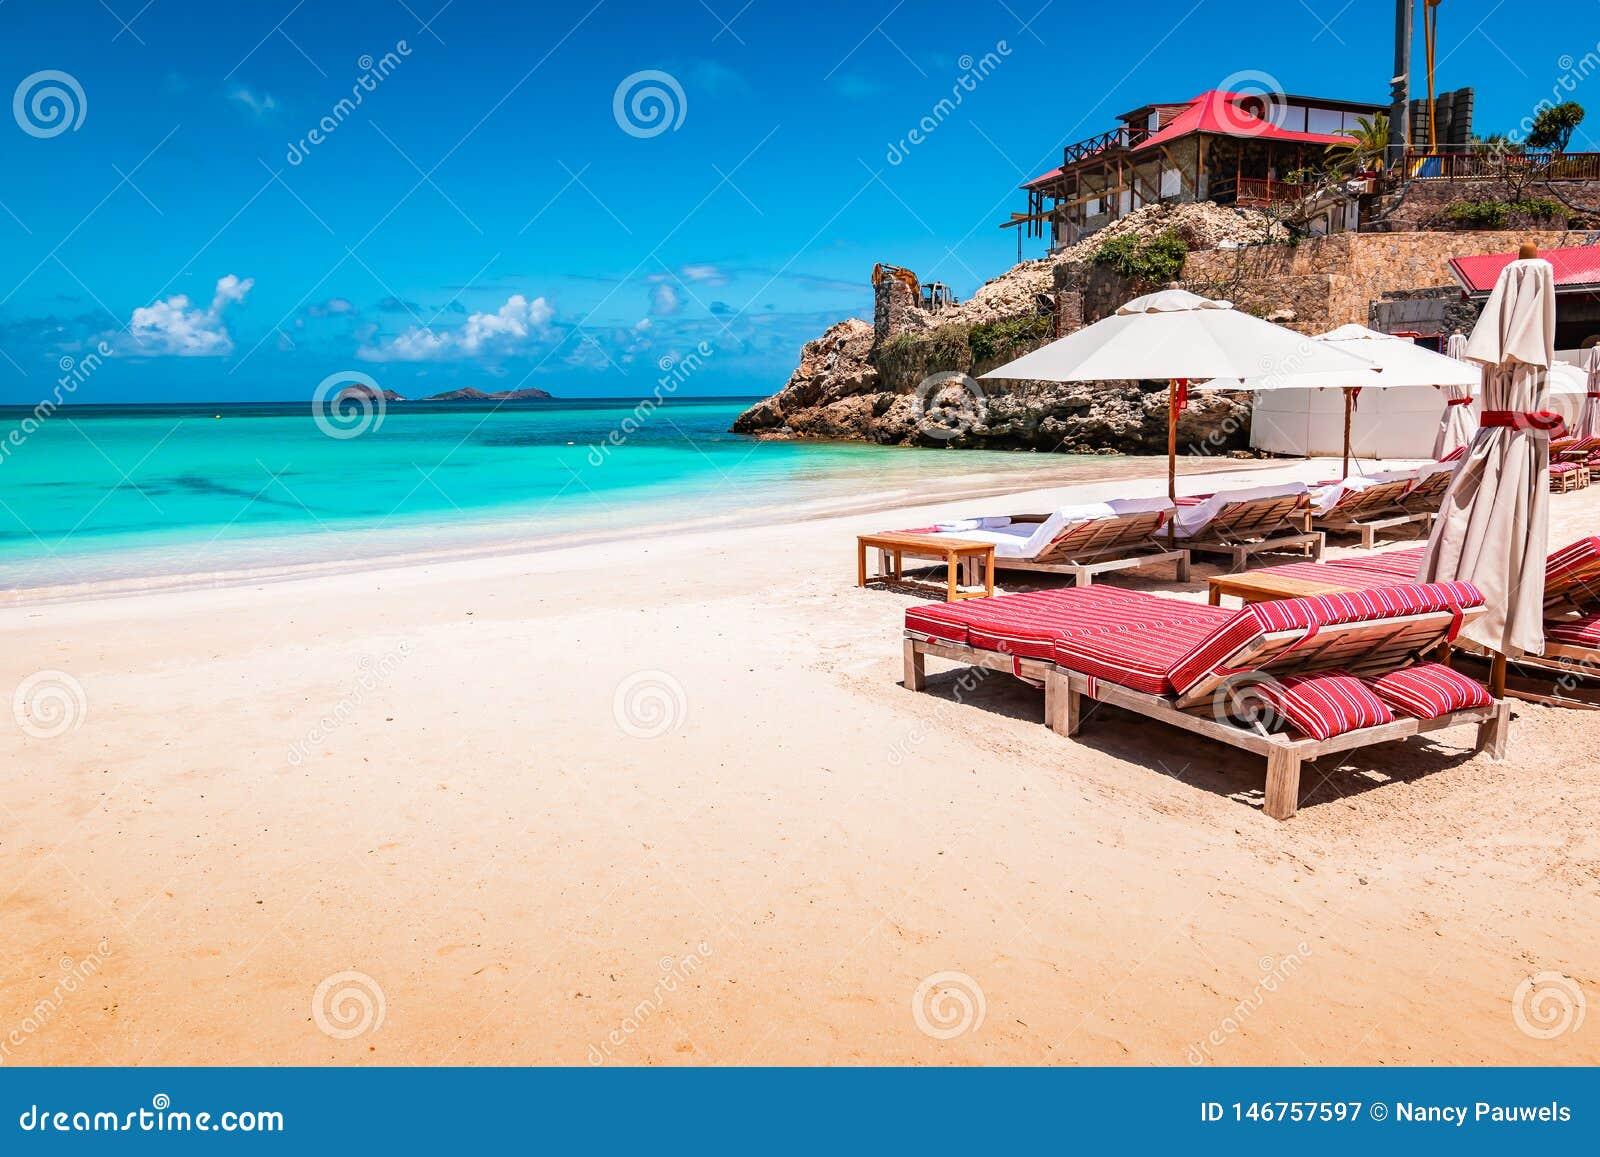 Luxury beach chairs and umbrella on exotic beach in St Barths, Caribbean Island.